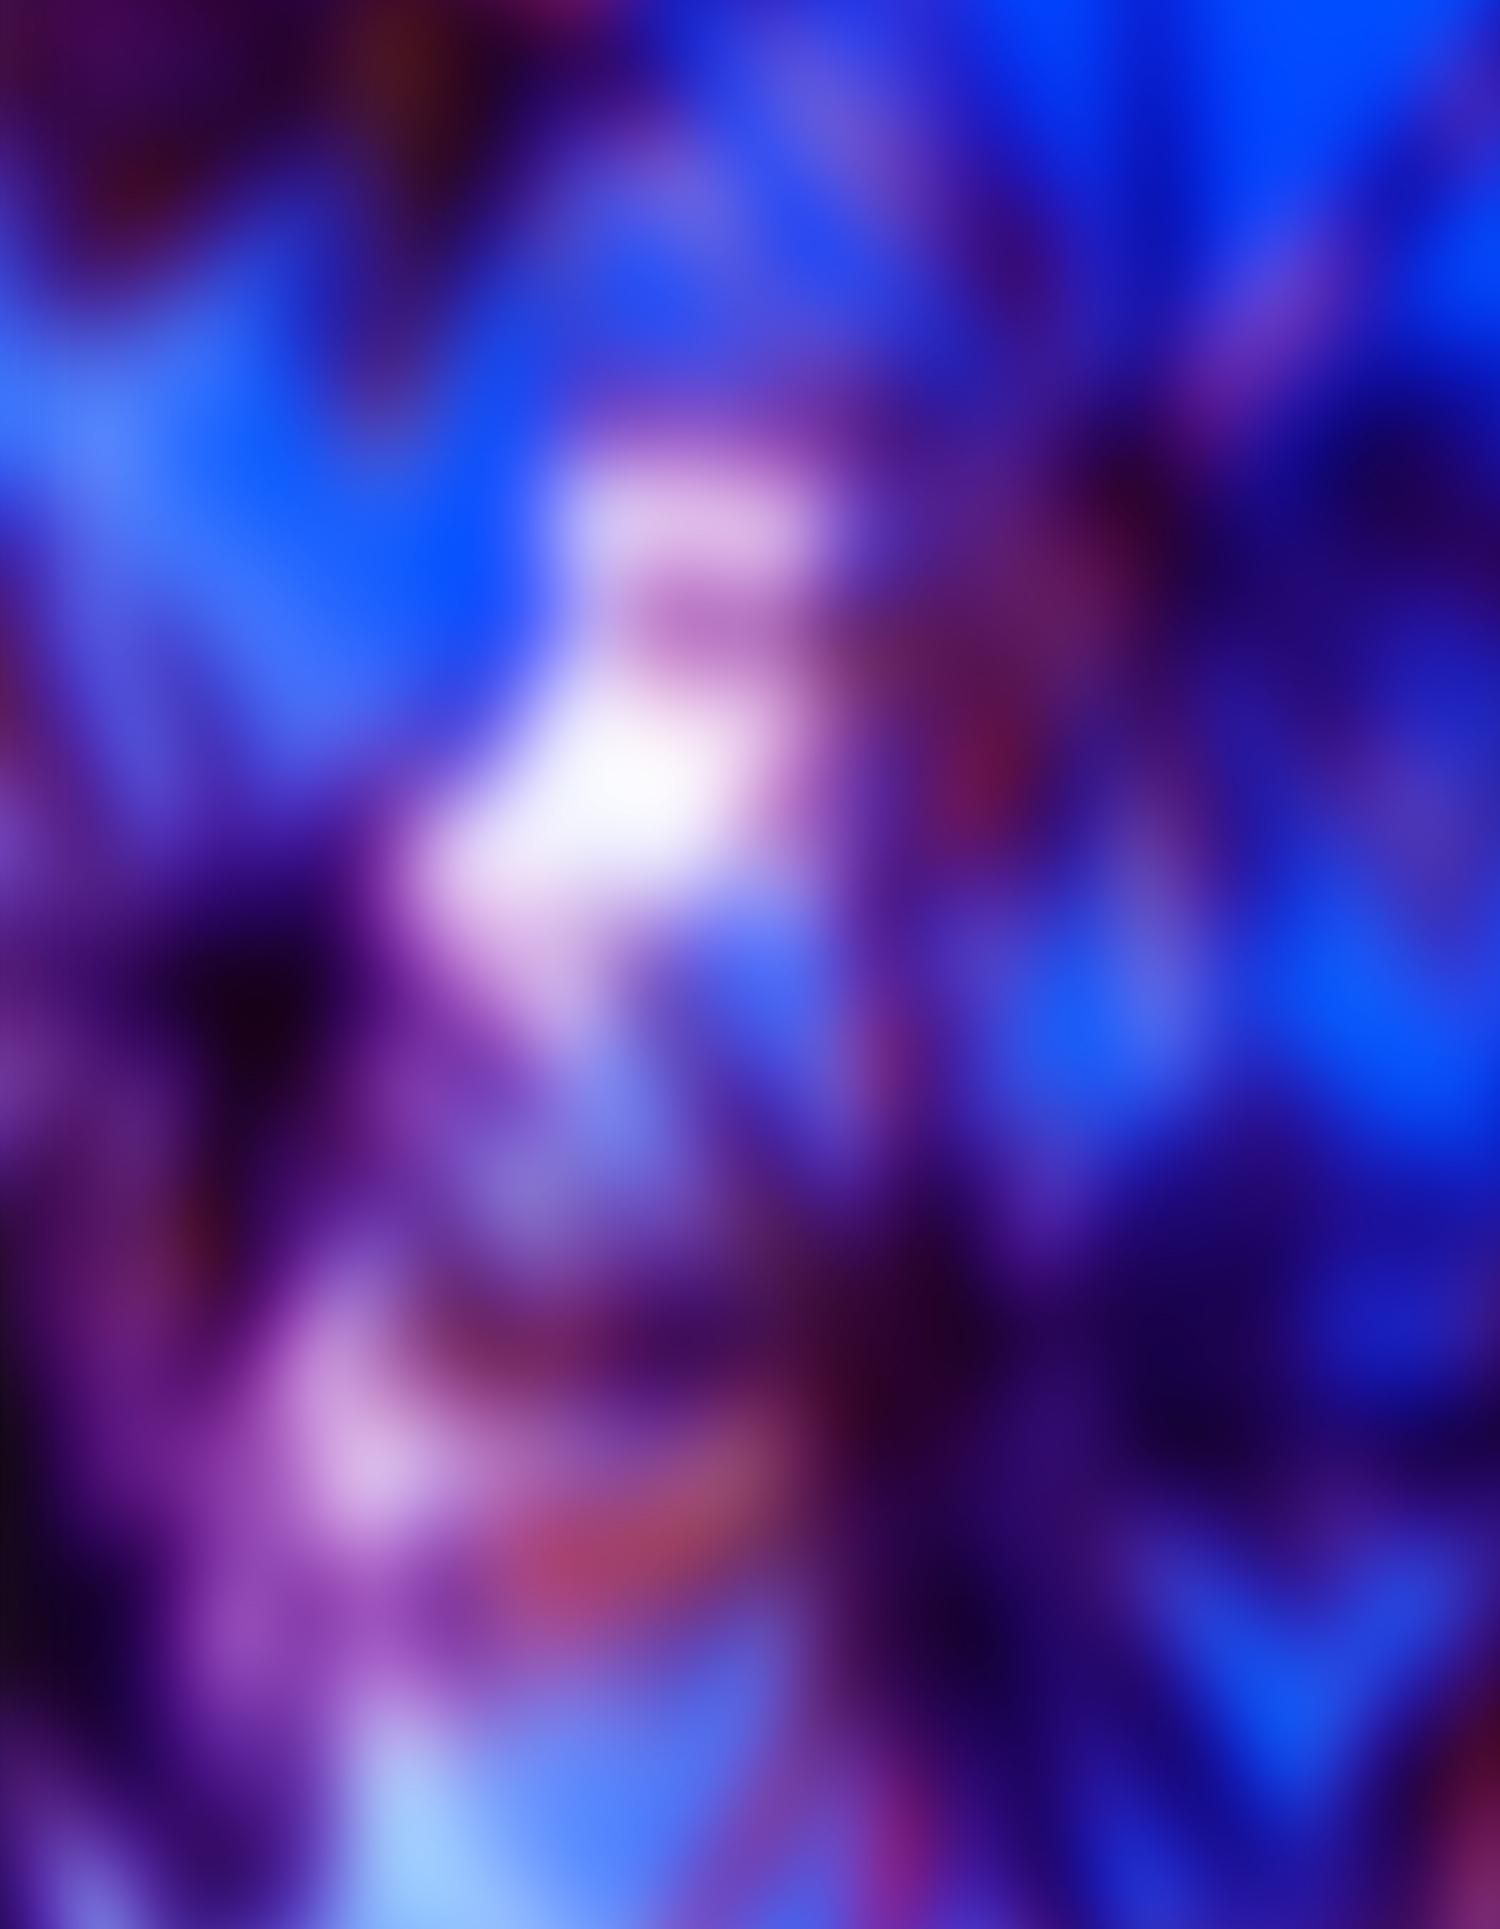 Ry David Bradley    Skyward 2  Dye transfer on synthetic velvet 62 x 48 in (157.5 x 121.9 cm)